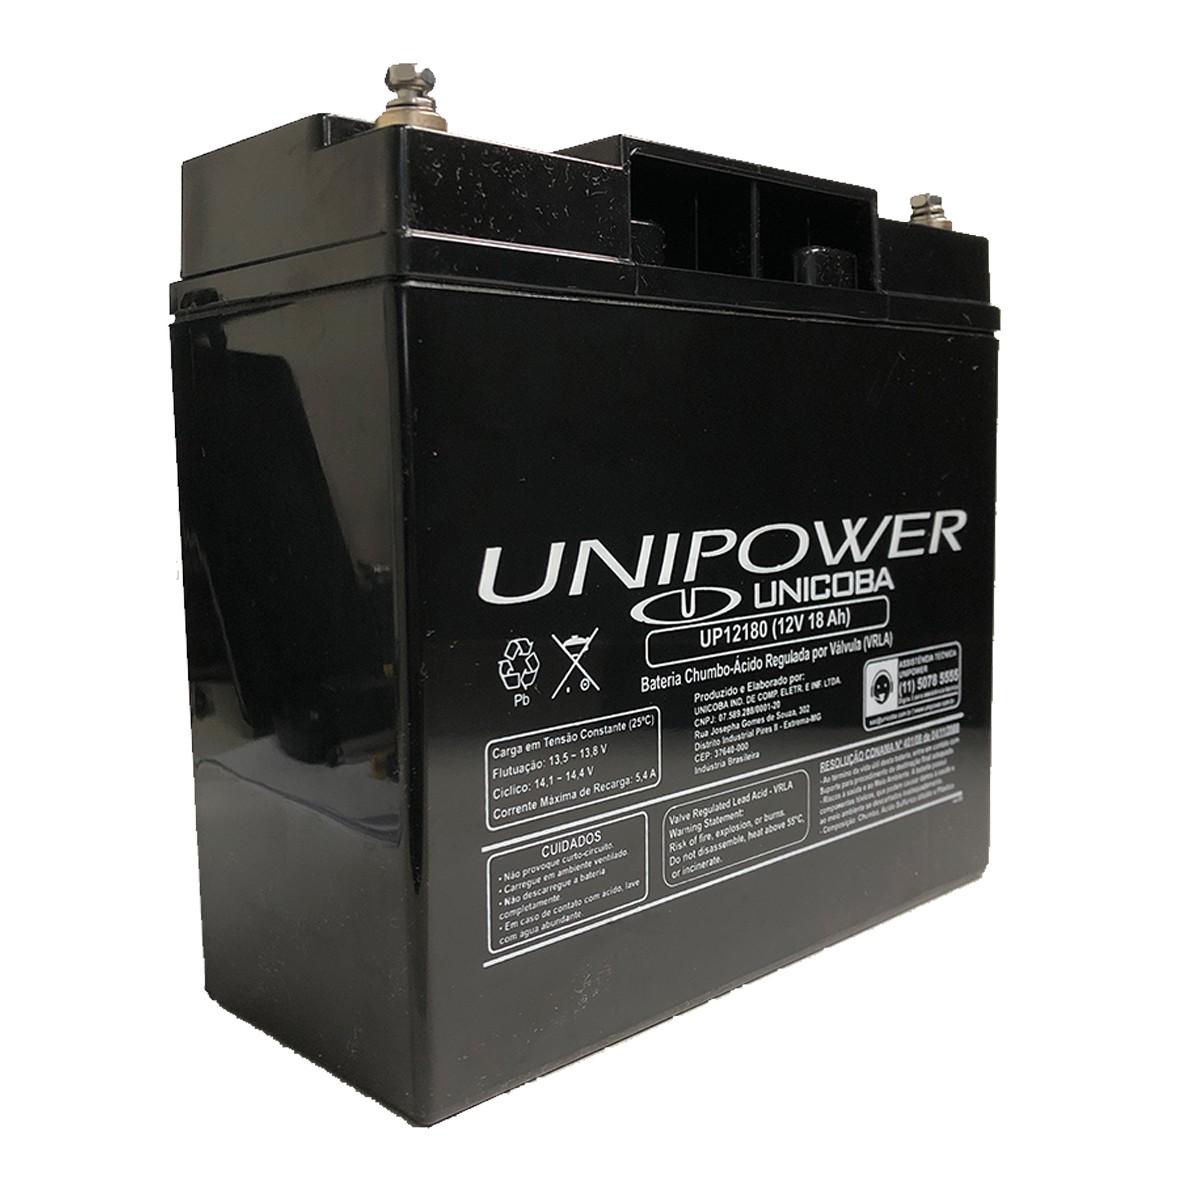 Bateria Unipower para Nobreak UP12180-06C029 M5 12V 18.0Ah